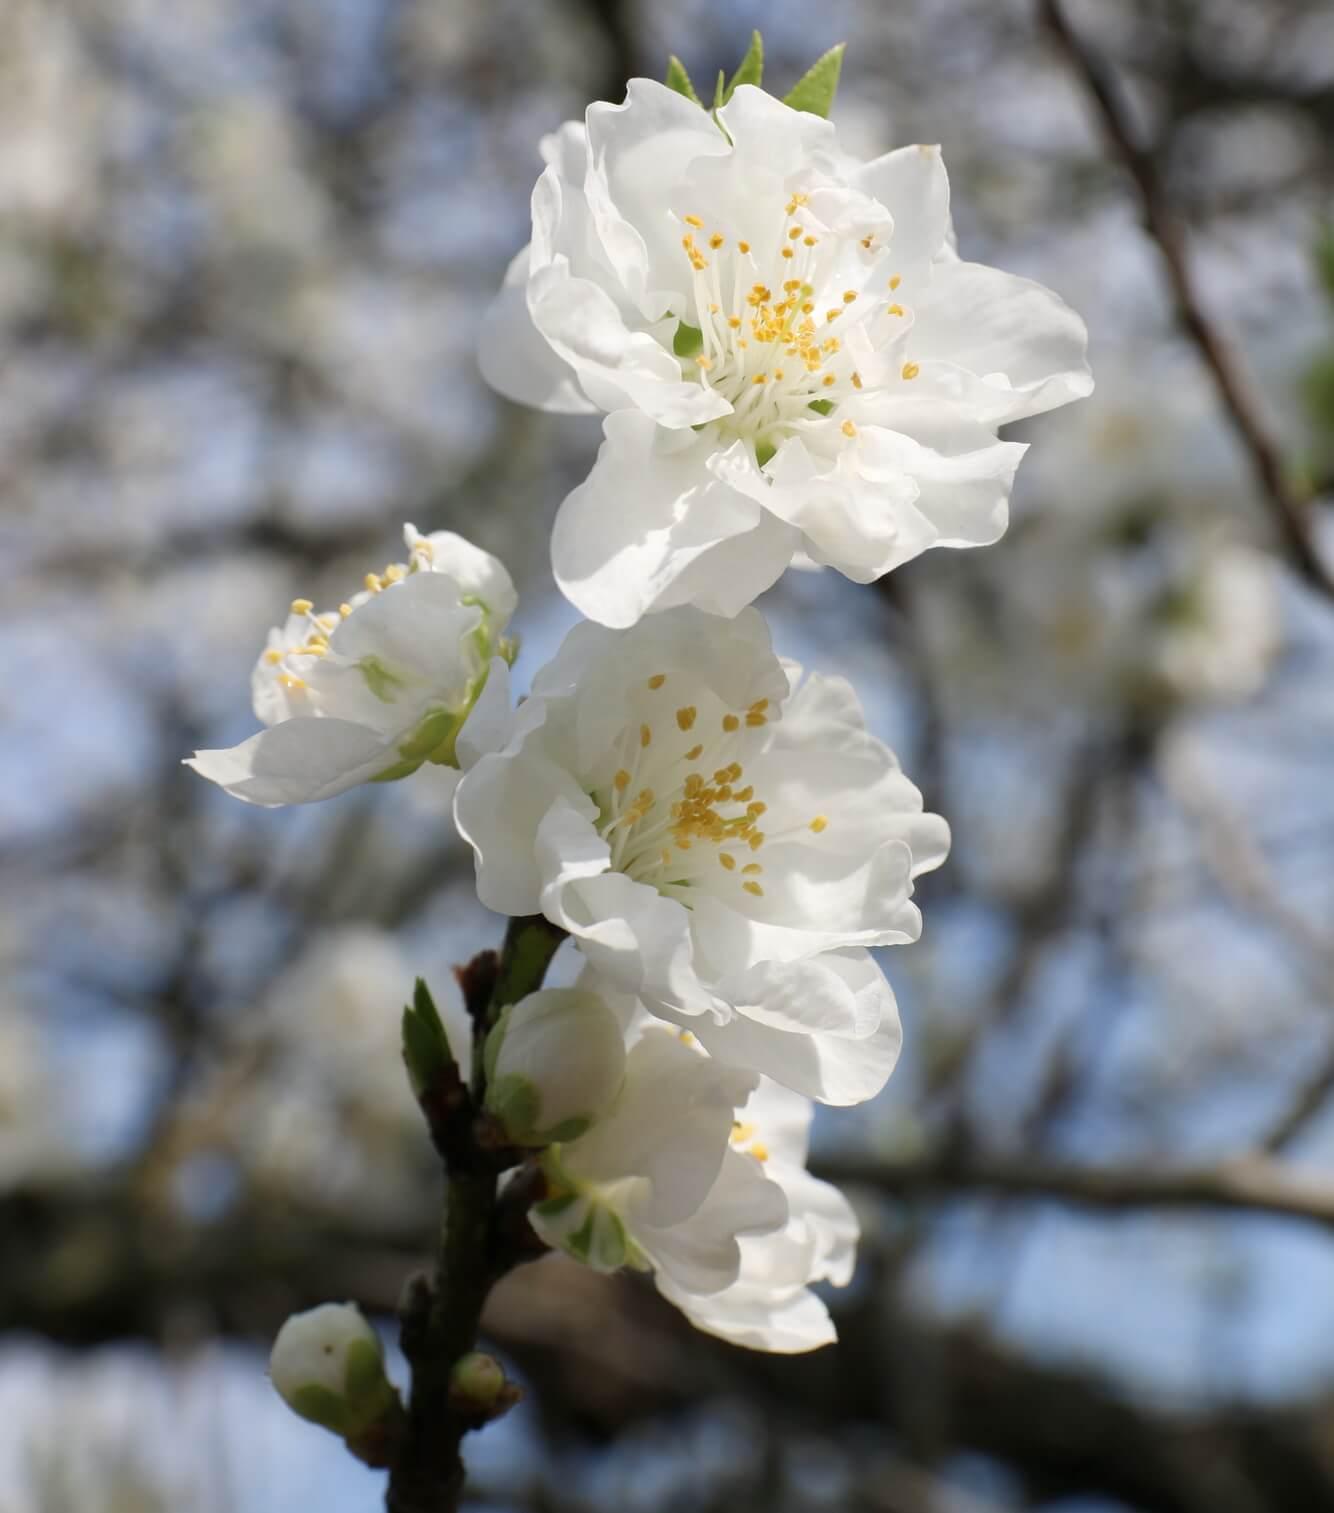 2. Thế giới màu hồng ở Hanamomo no Sato! Lễ hội Kogamomo lần 43